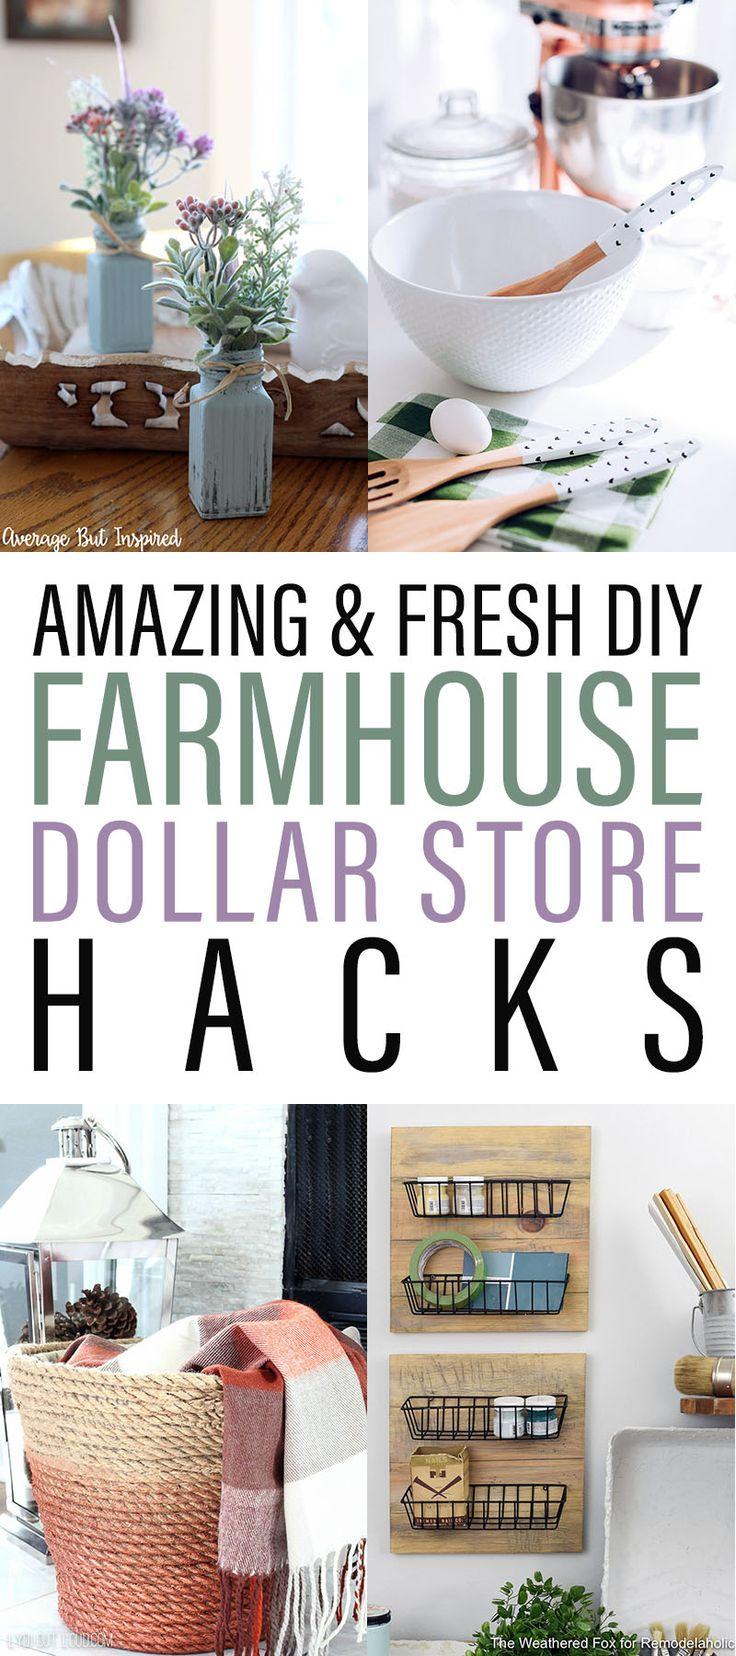 Amazing & Fresh DIY Farmhouse Dollar Store Hacks